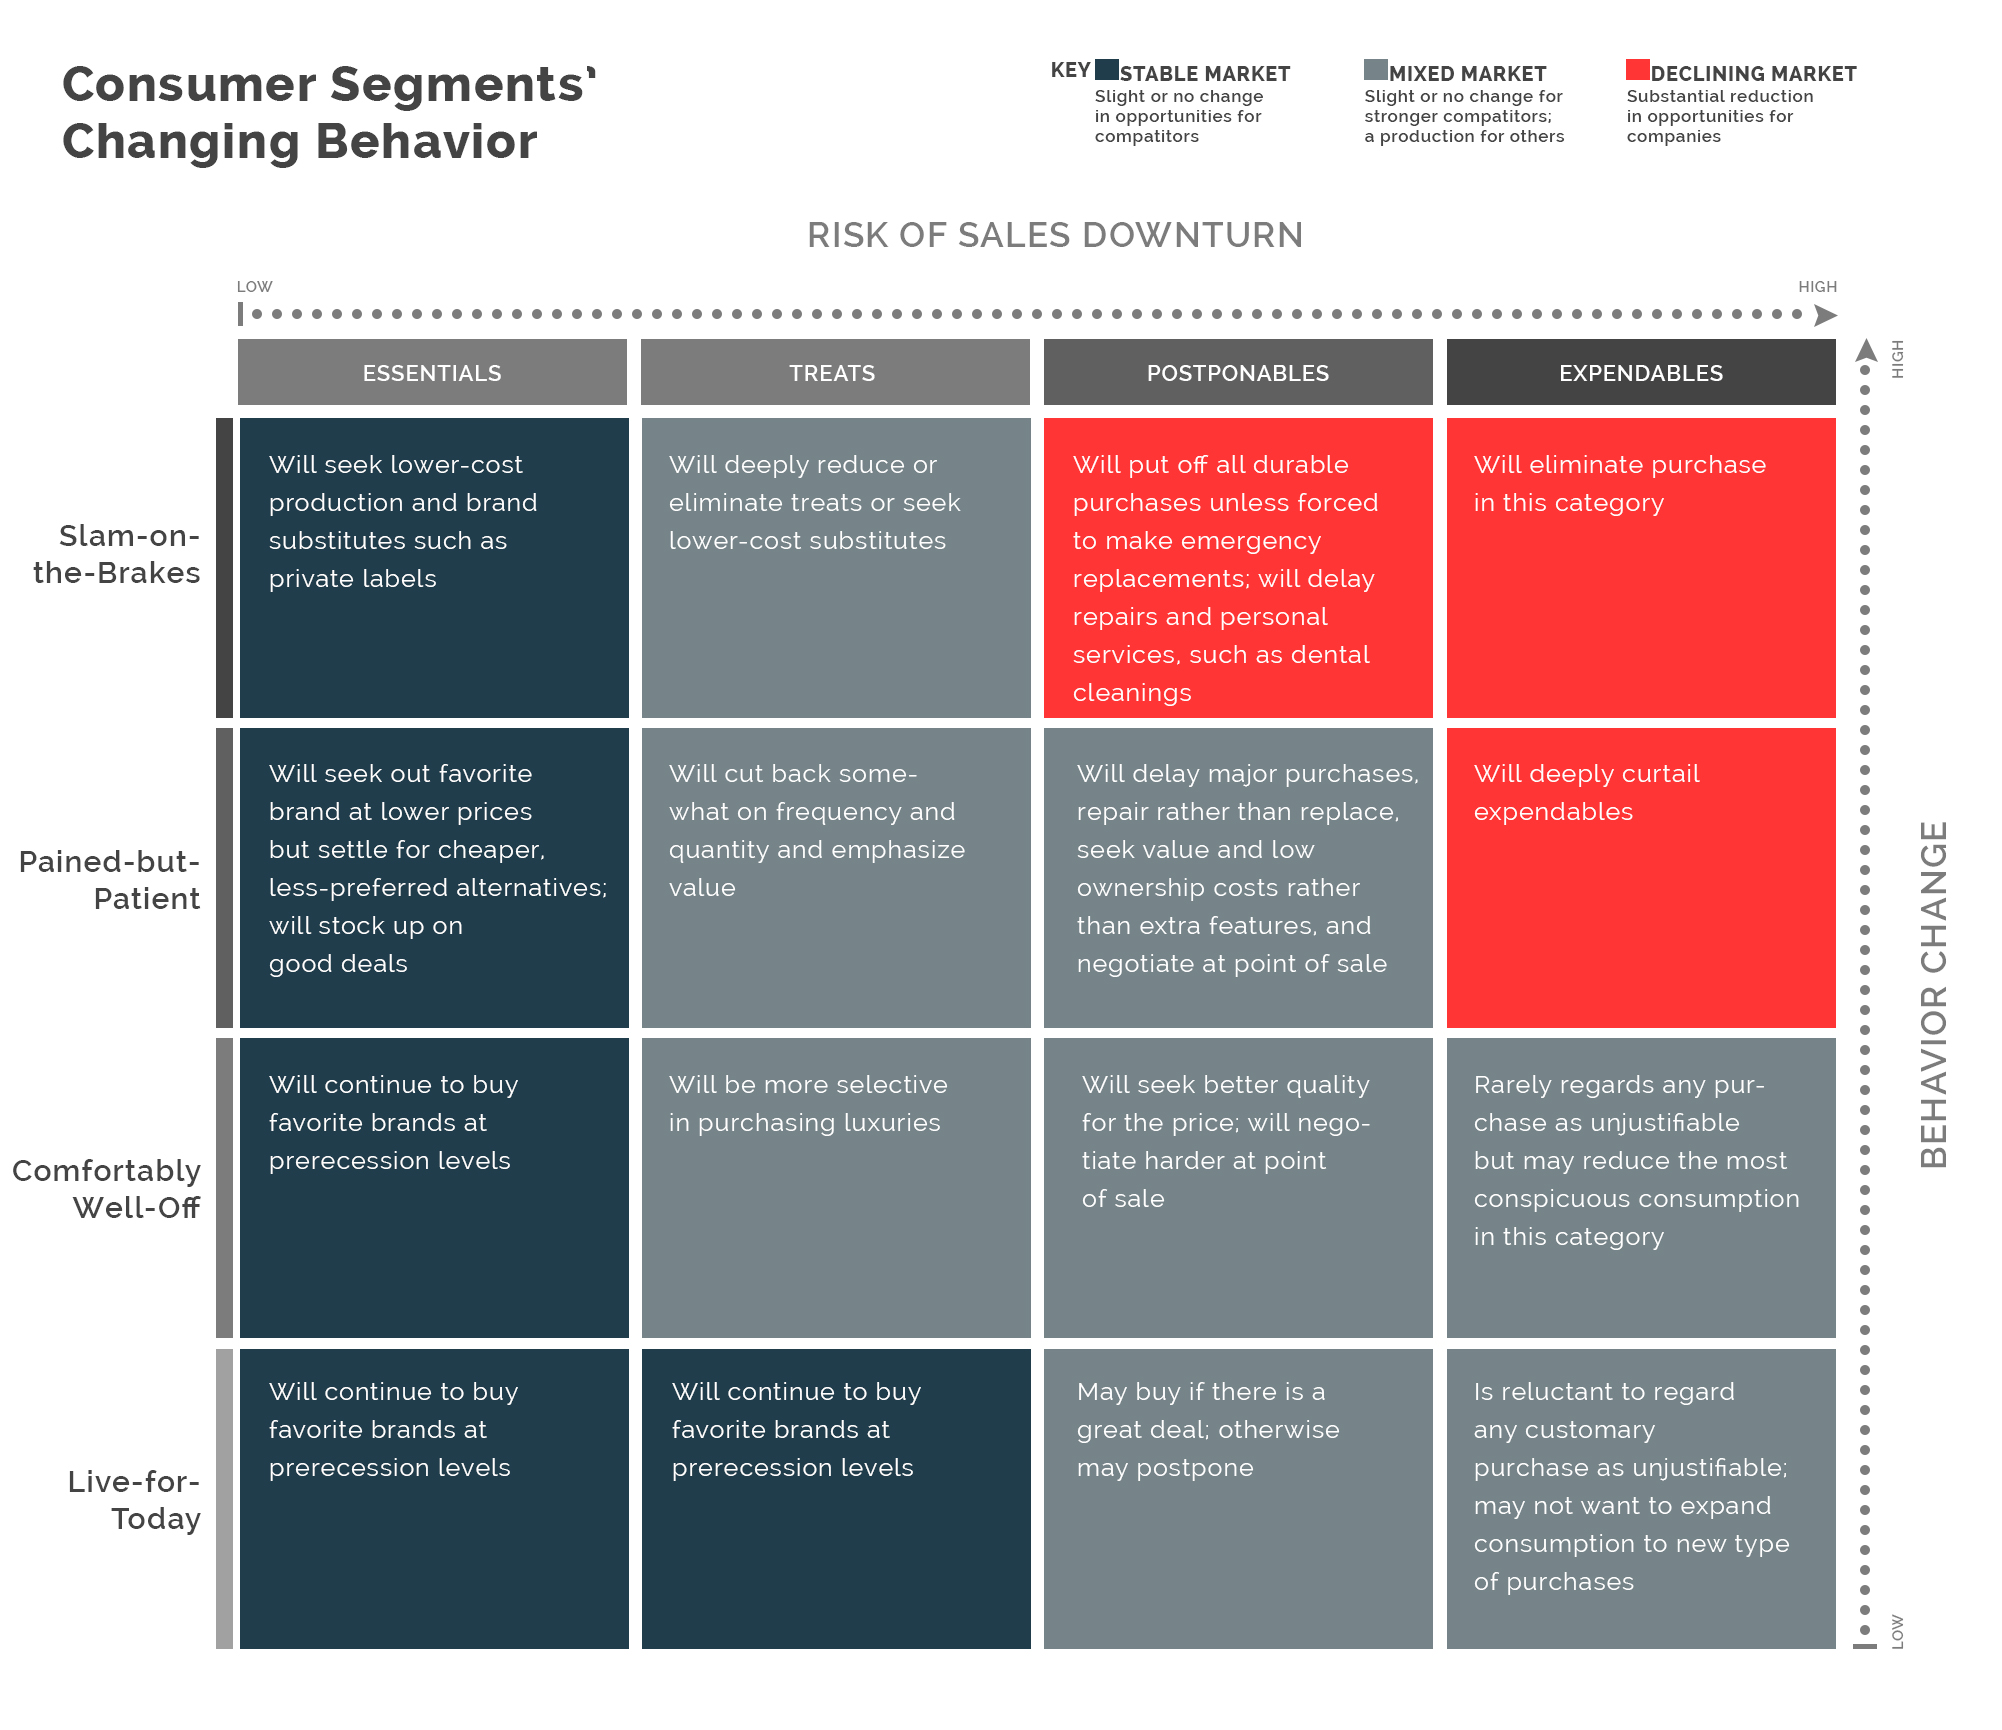 Consumer's Segments' Changing Behavior